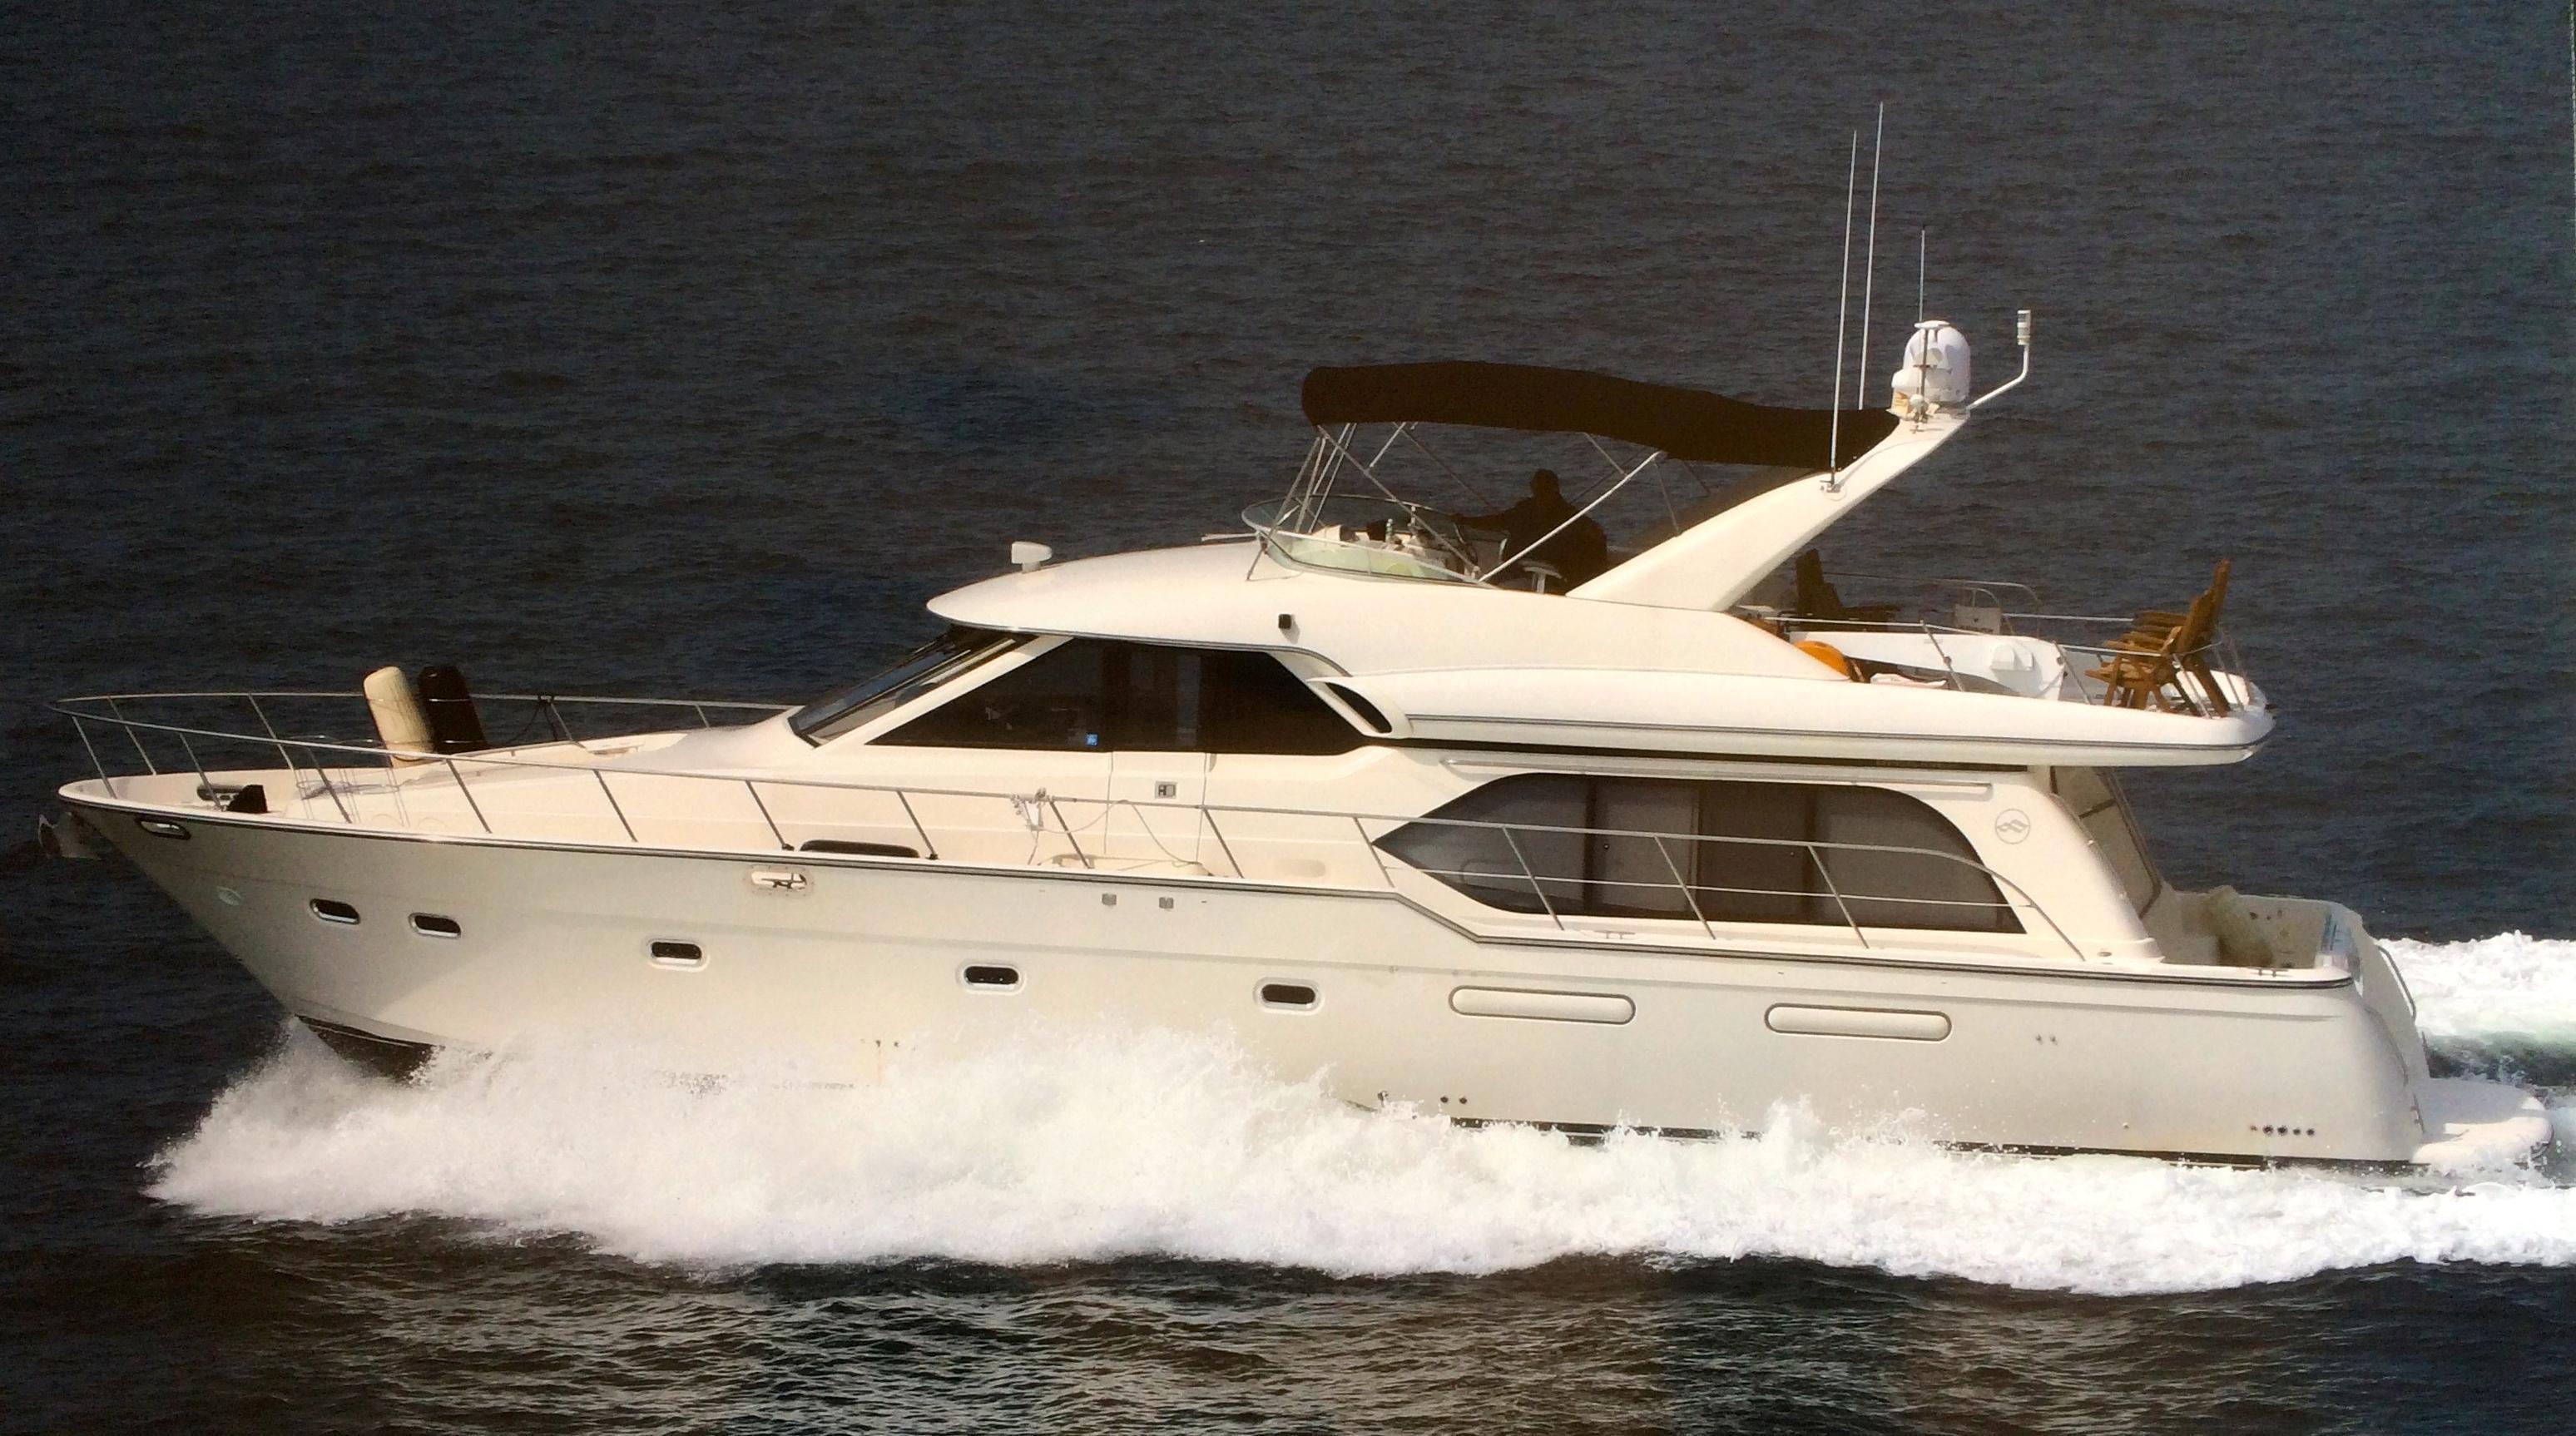 Bayliner 5788 Pilot House Motoryacht, Mattituck